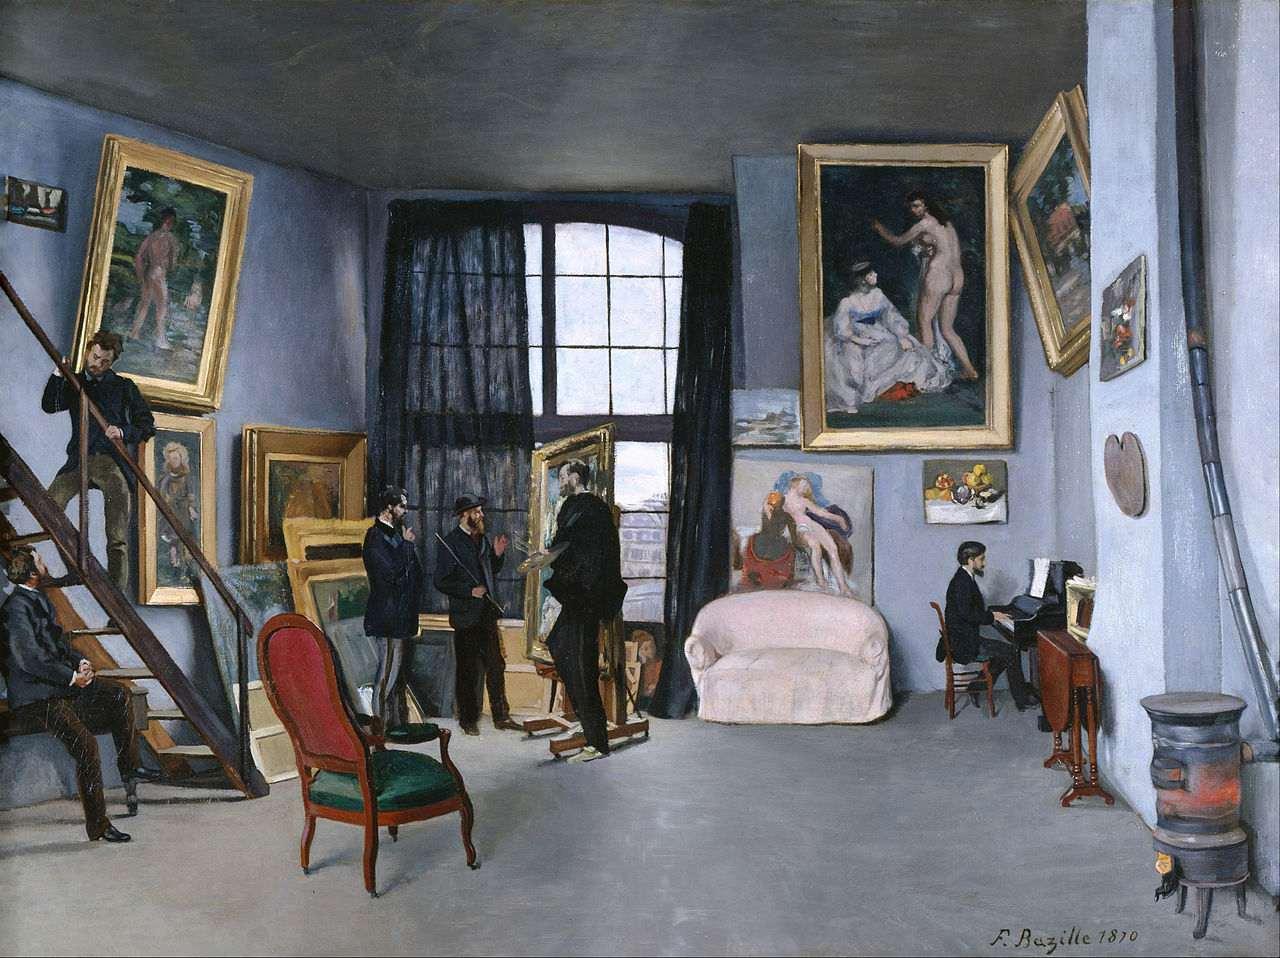 Bazille's Studio, Frédéric Bazille, 1870